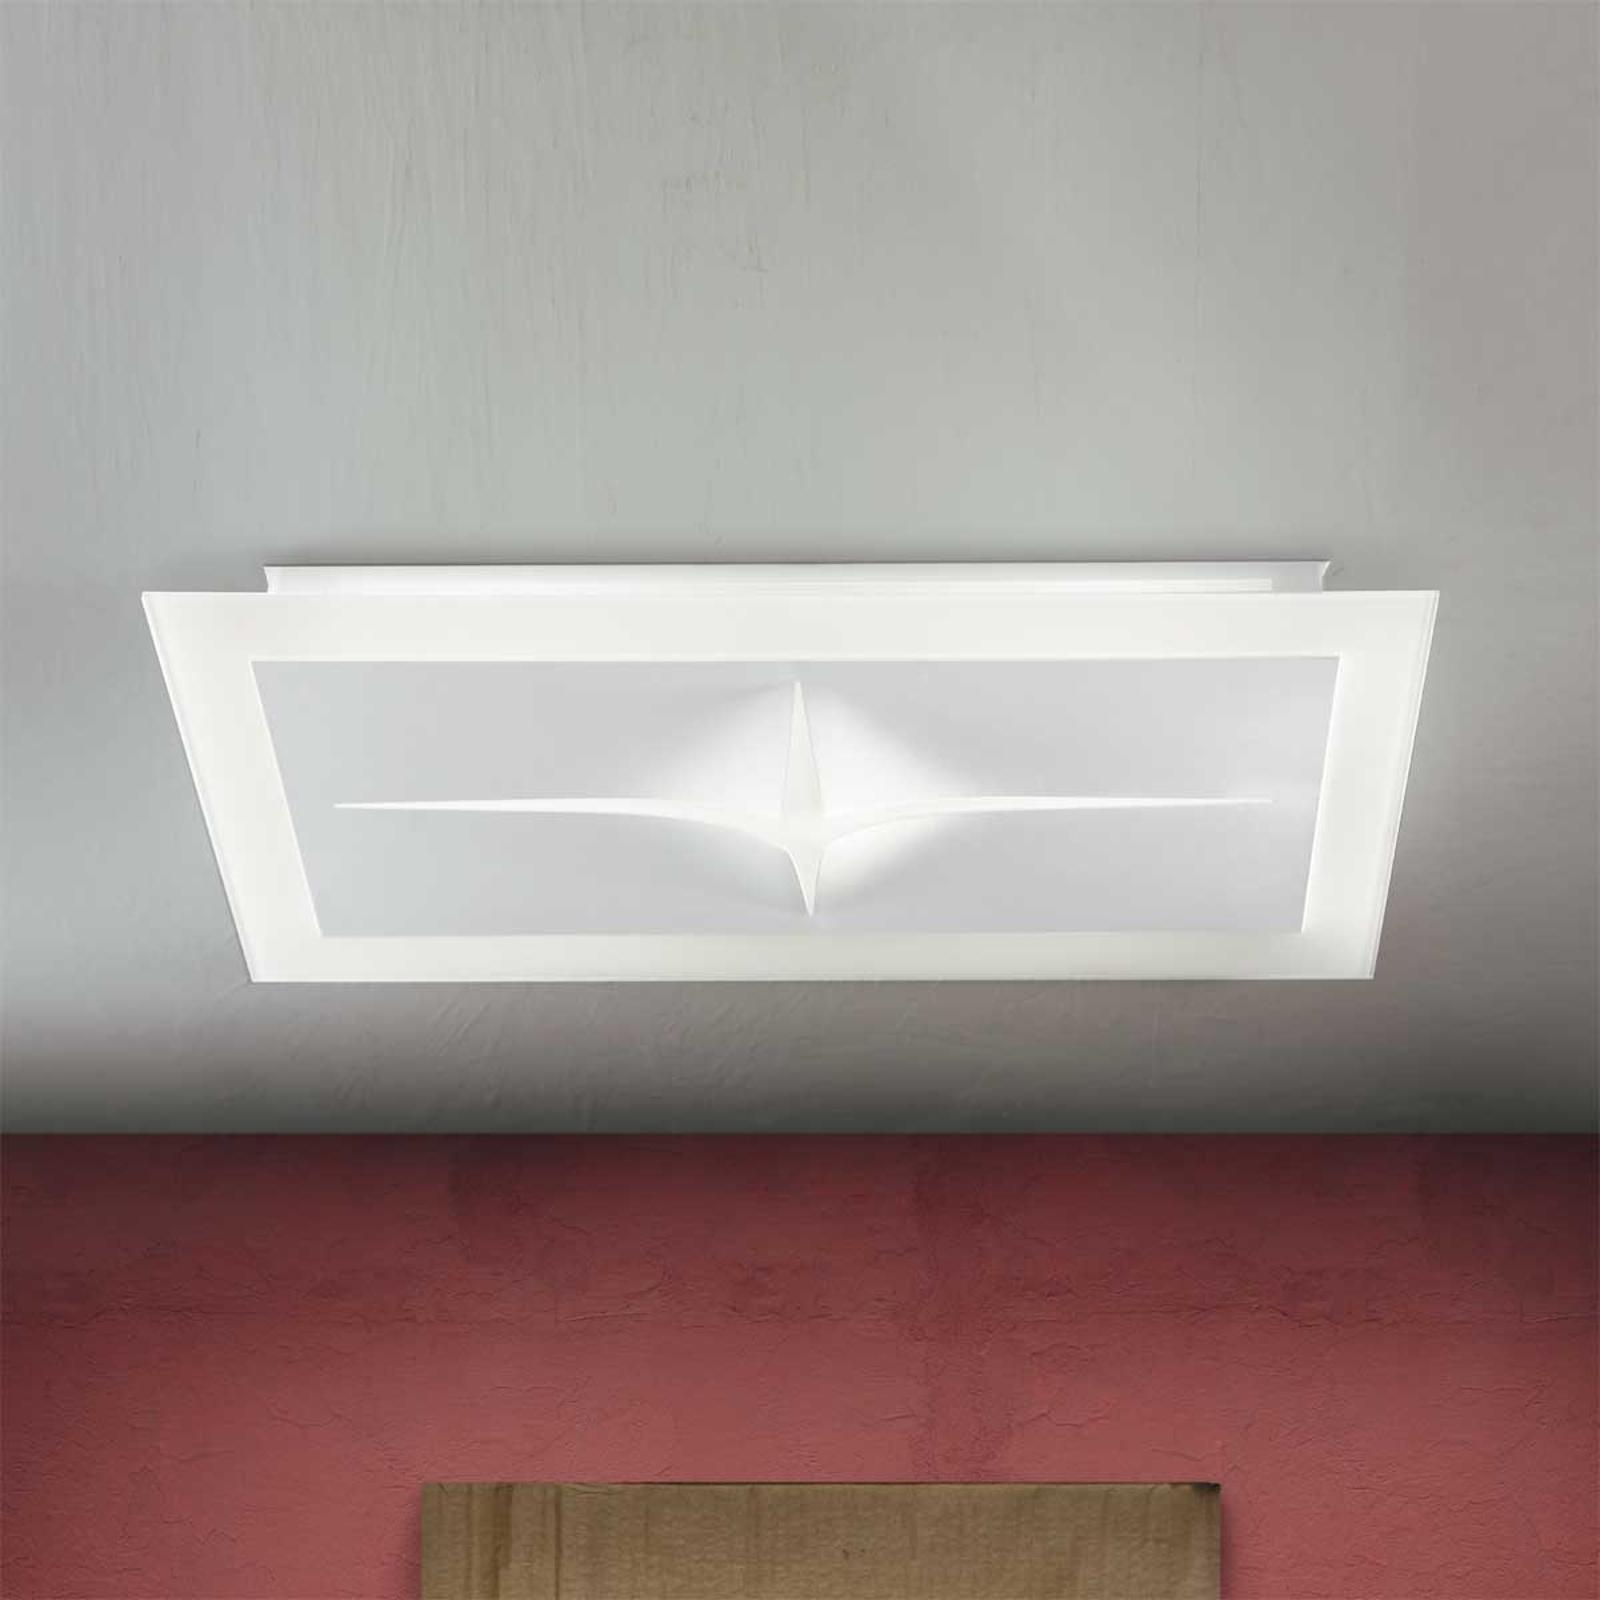 Kreatywna lampa sufitowa CROSS 8195 E27 72 cm